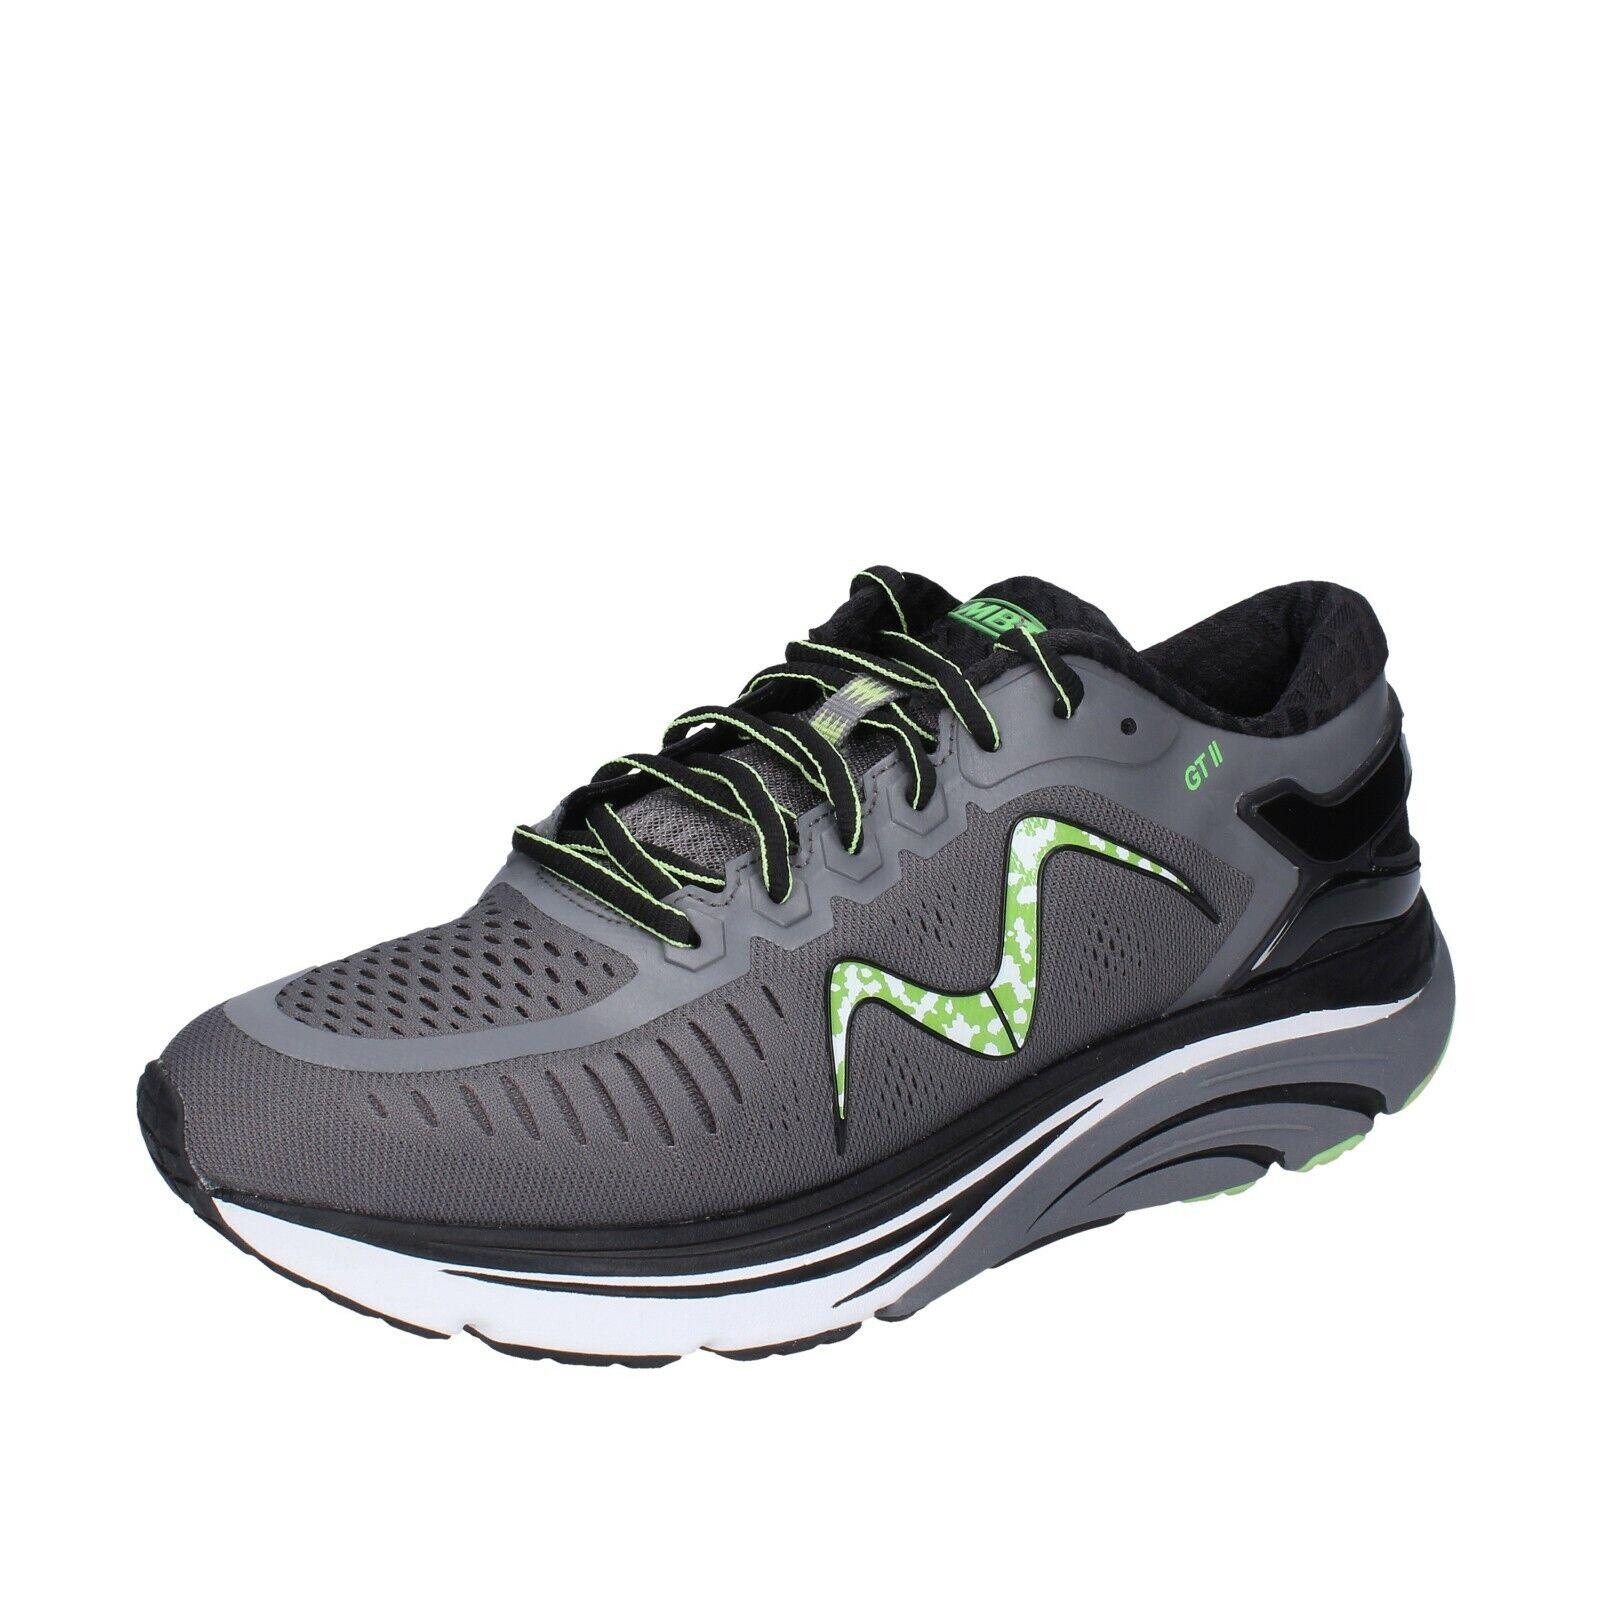 Men's shoes mbt 42,5 EU shoes gray green fabric bh643